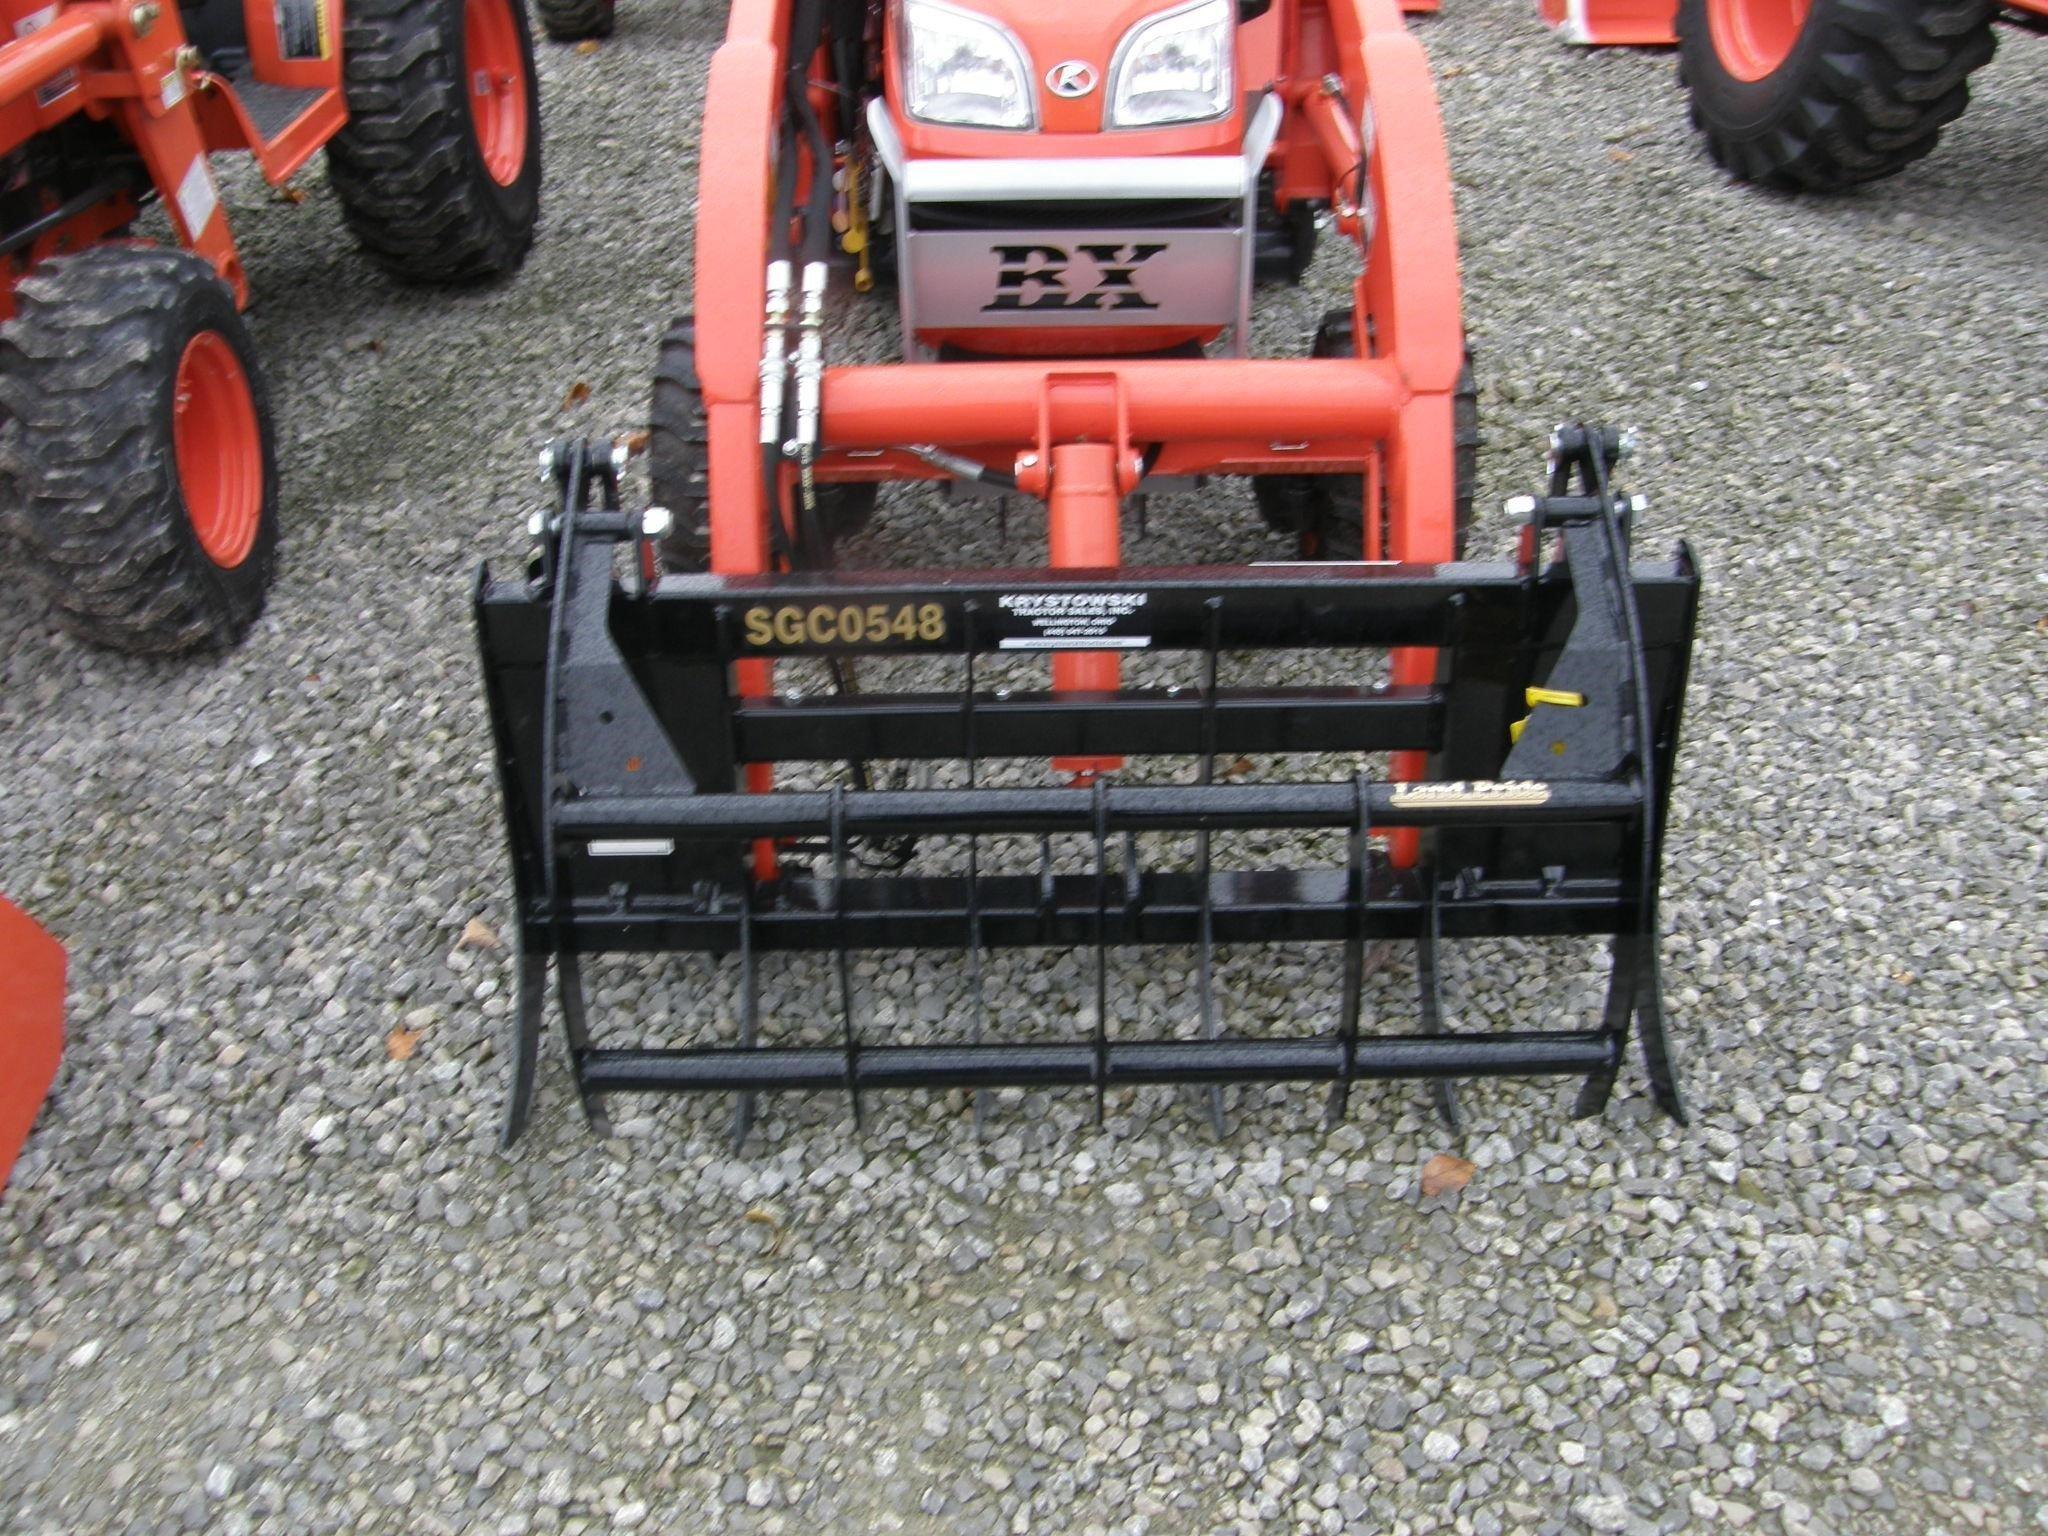 Land Pride SGC0548 Loader and Skid Steer Attachment